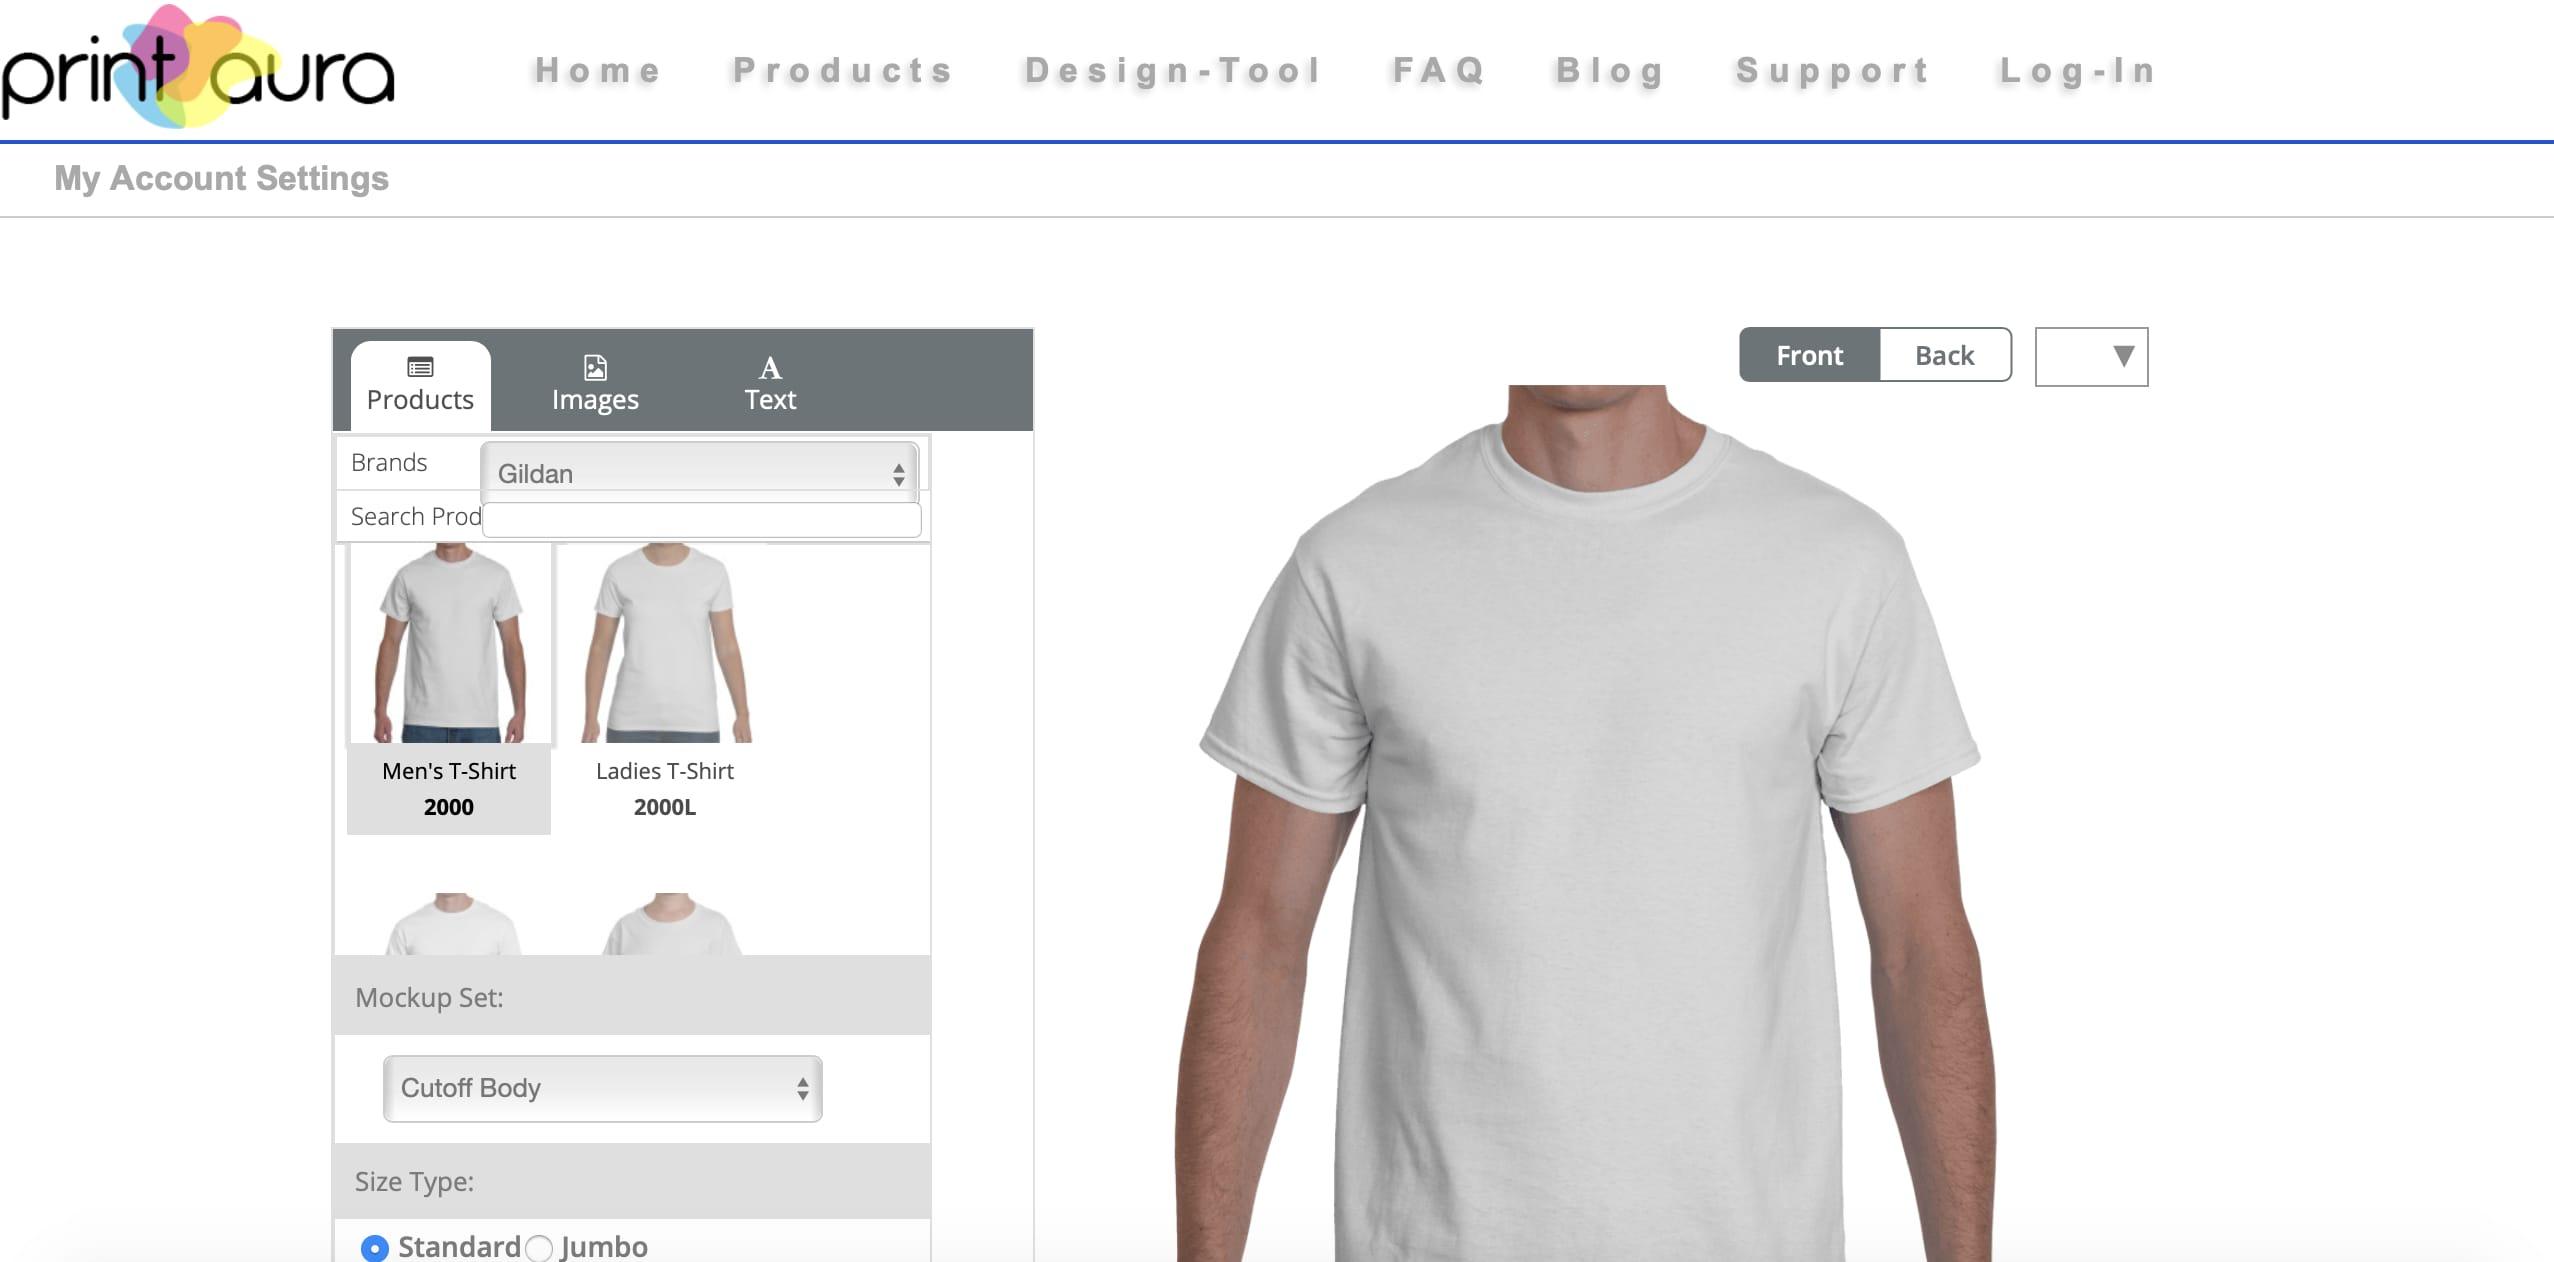 Plantillas-para-camisetas-gratis-Printaura